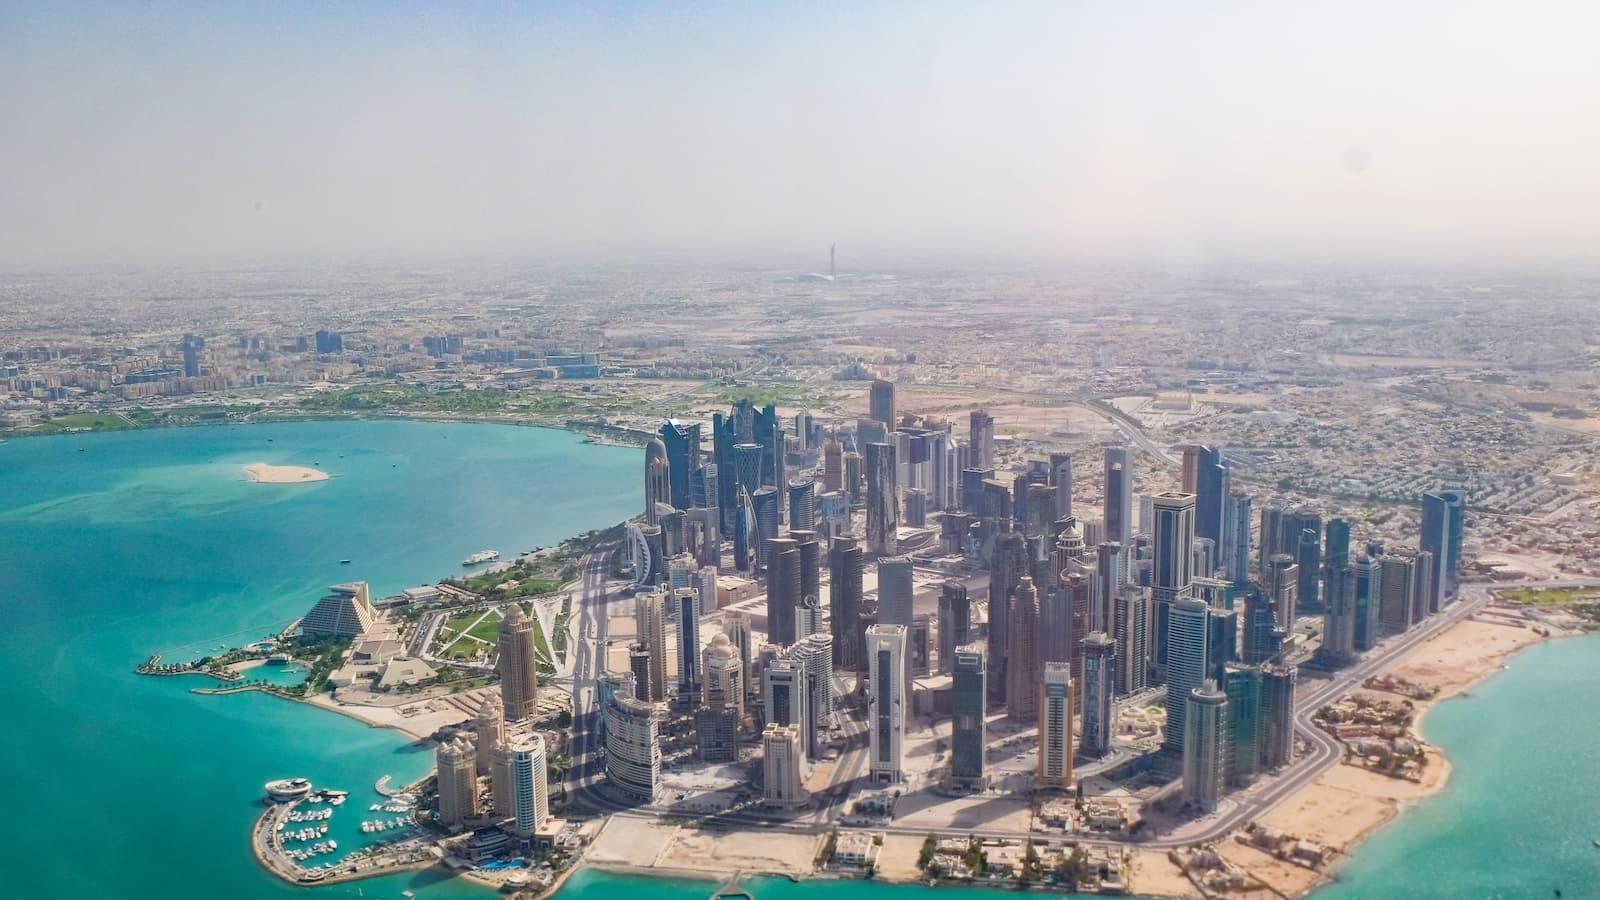 St. Petersburg International Economic Forum an opportunity to enhance Qatar-Russia ties: Al Khater